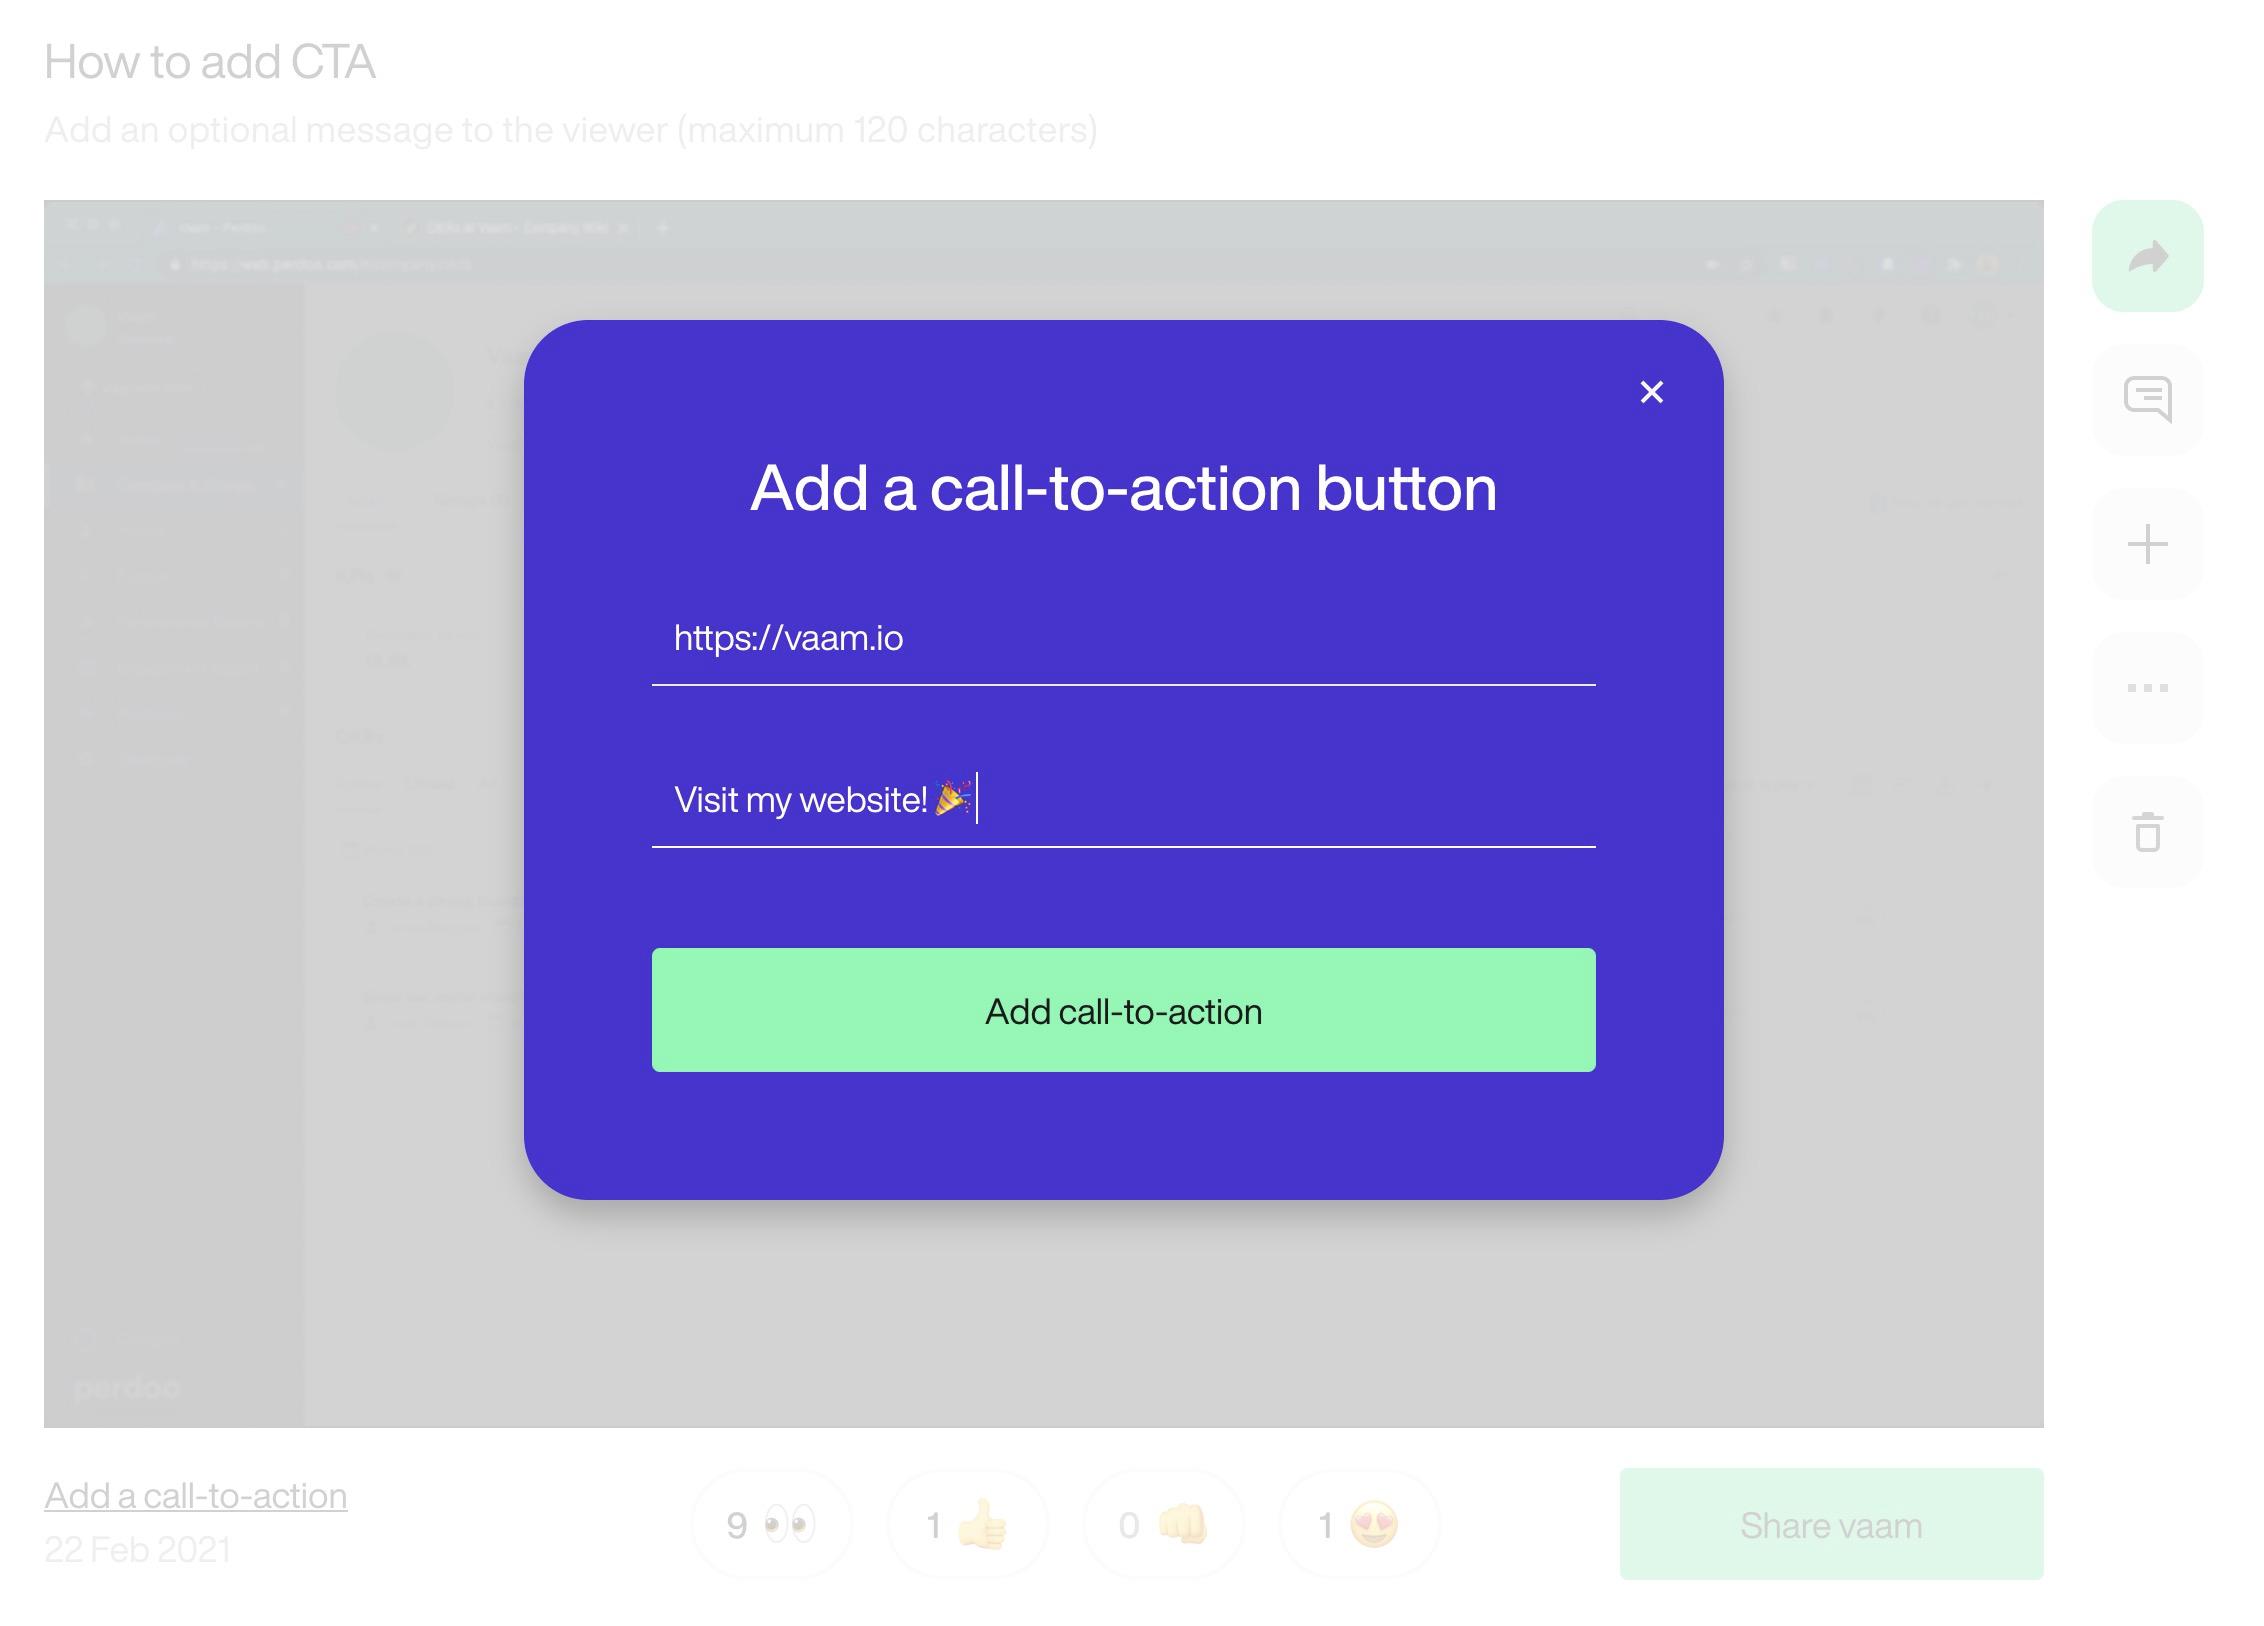 CTA creation modal